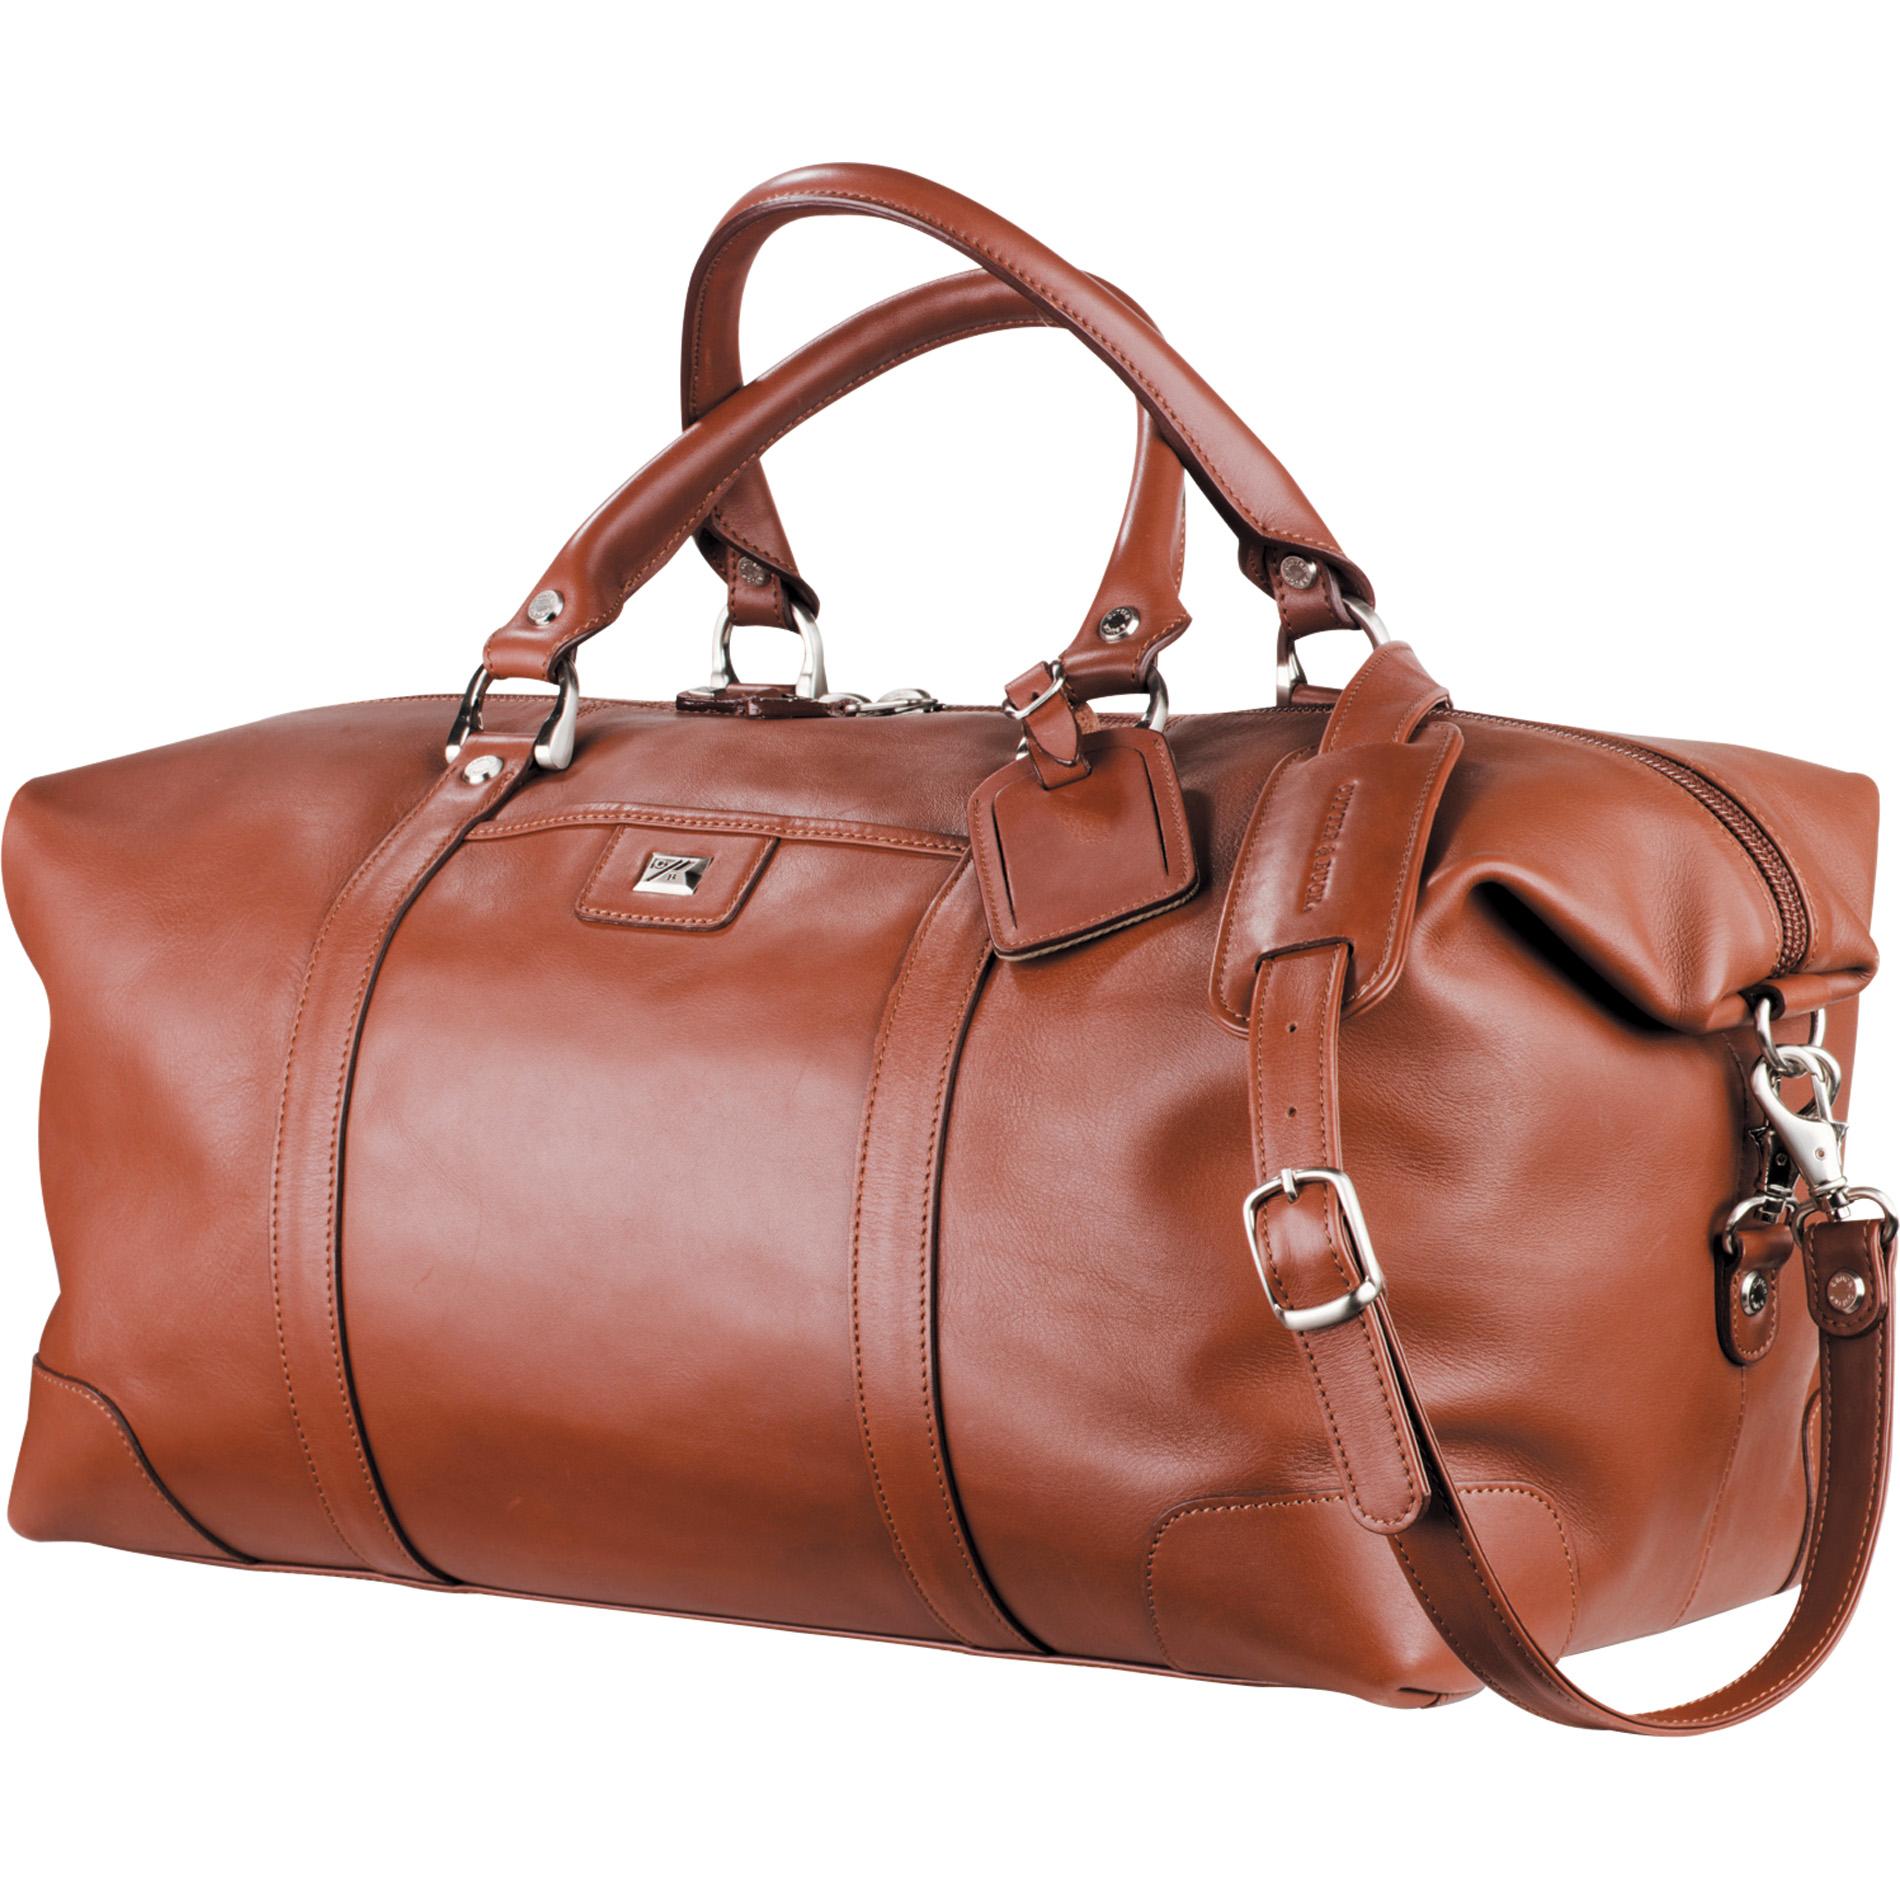 "Cutter & Buck 9800-83 - 19"" Leather Weekender Duffel Bag"